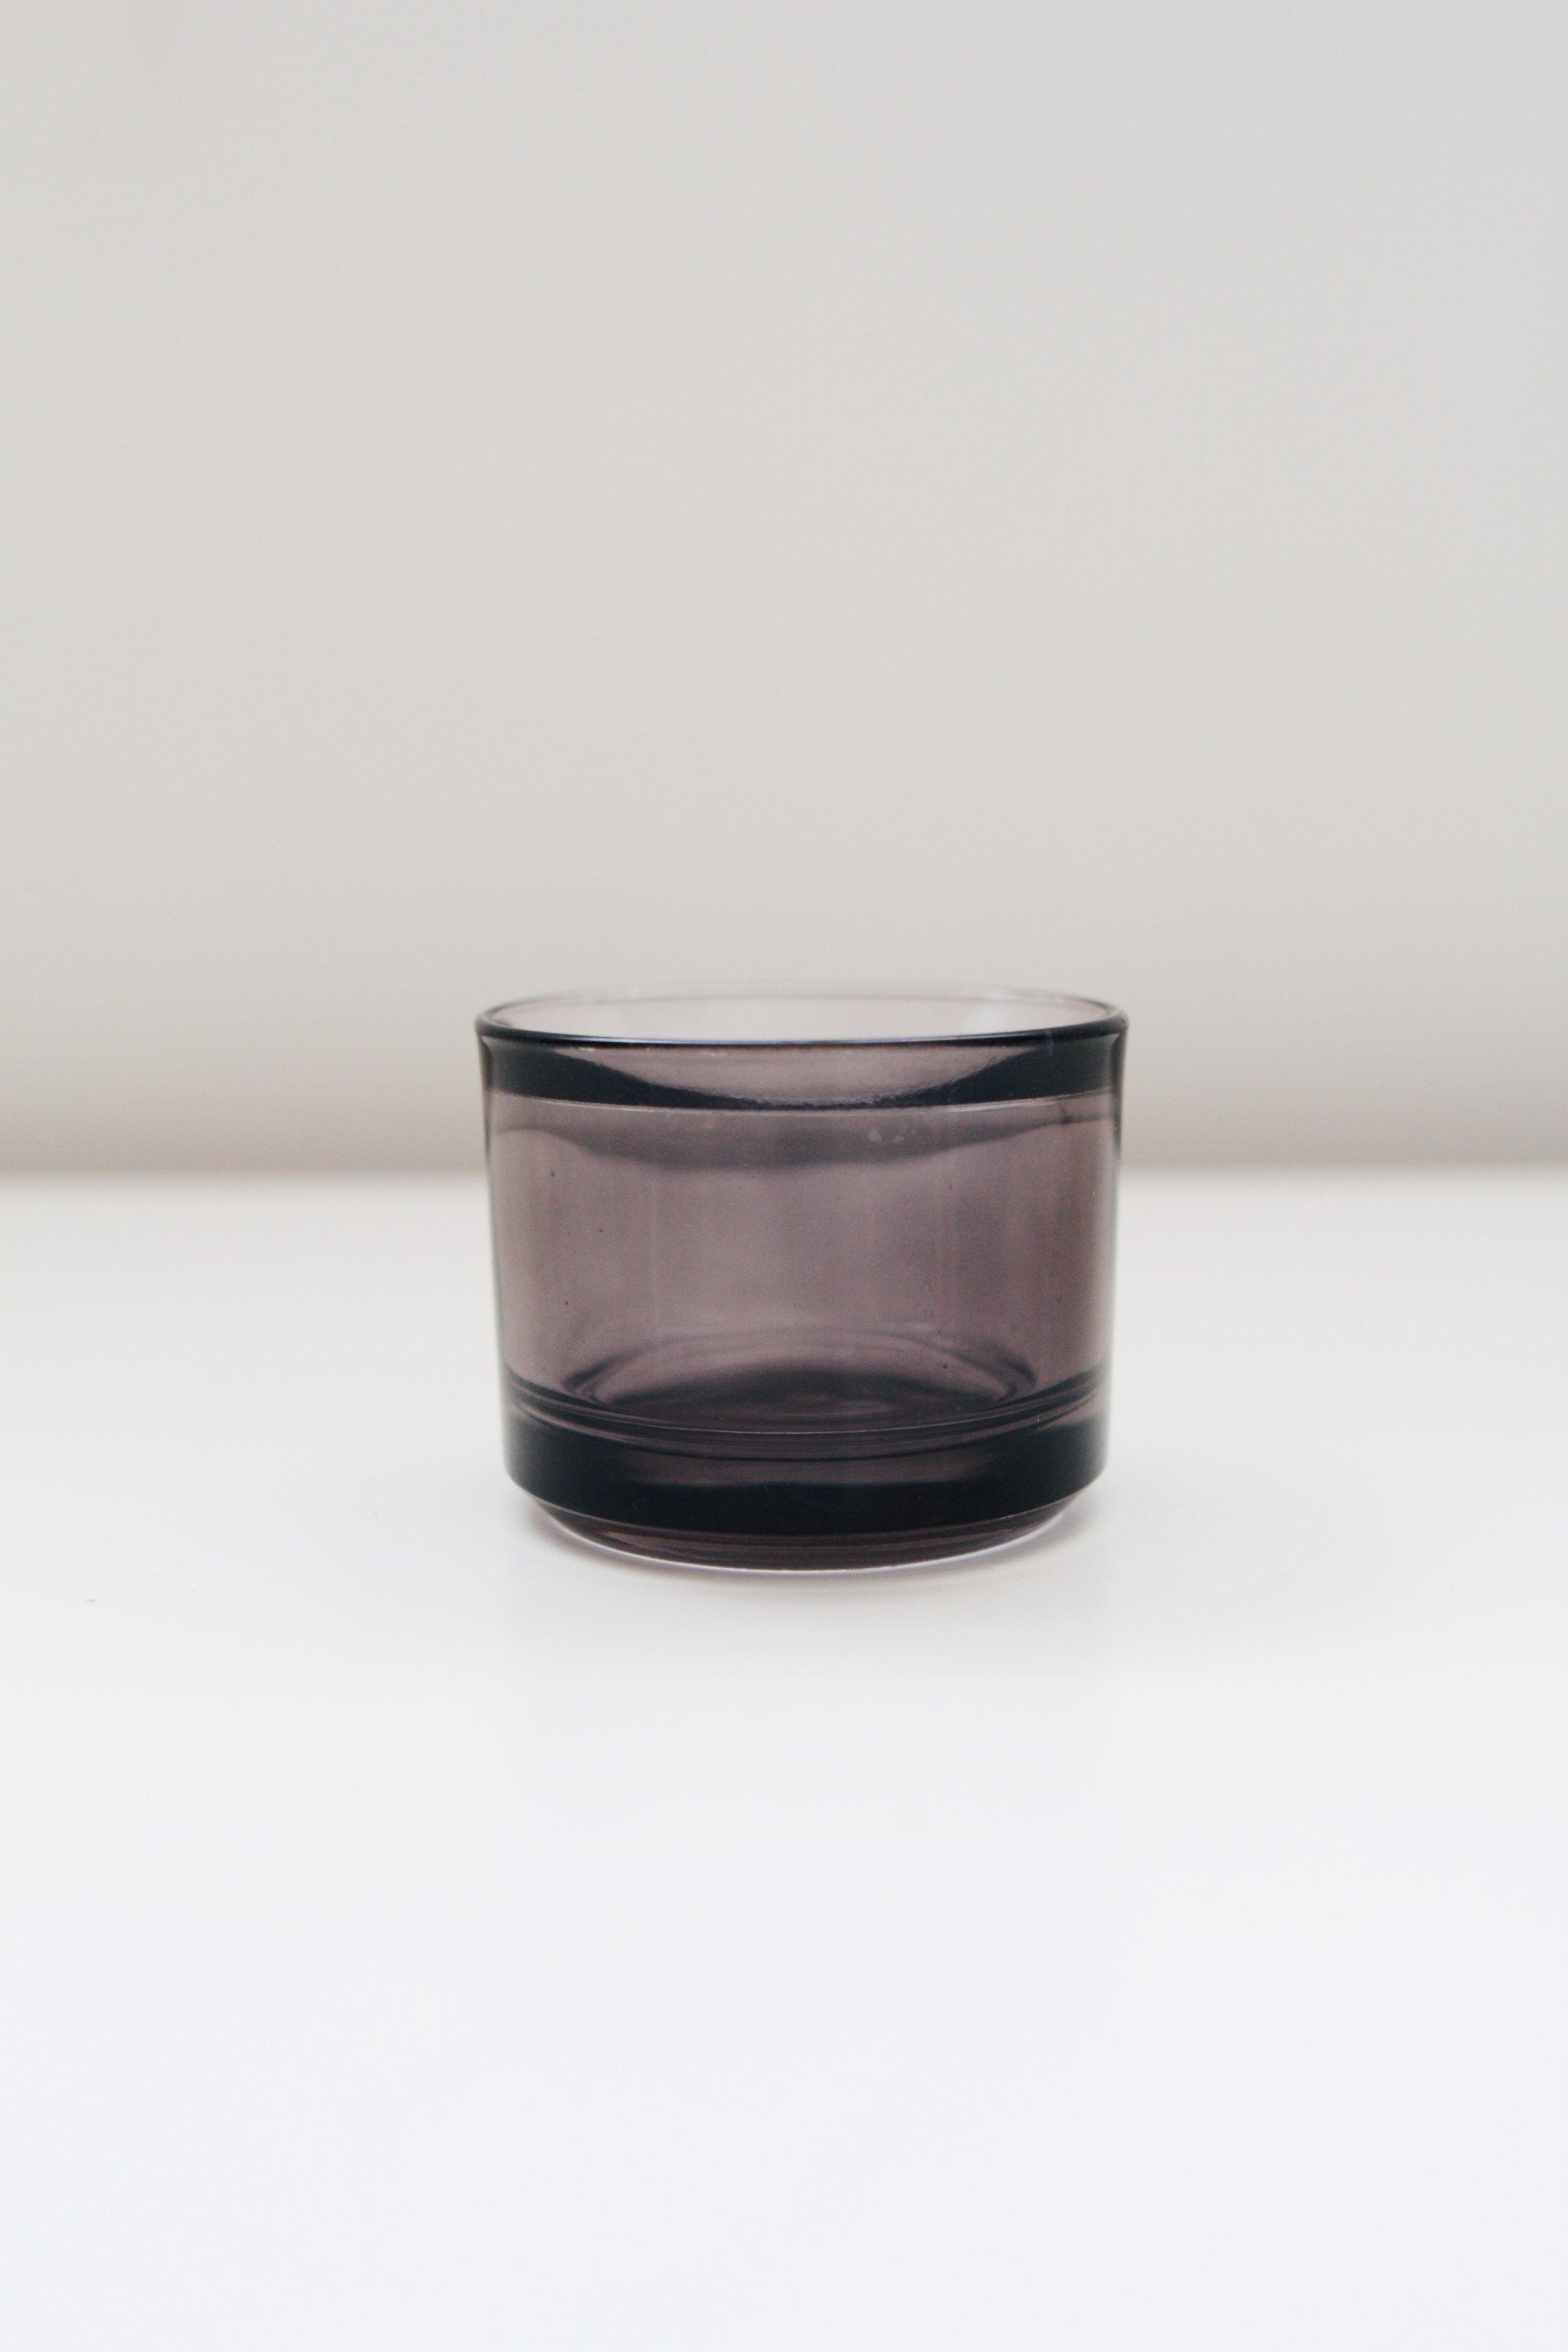 avideas-inventory-votives-smokeglass-SML1.JPG